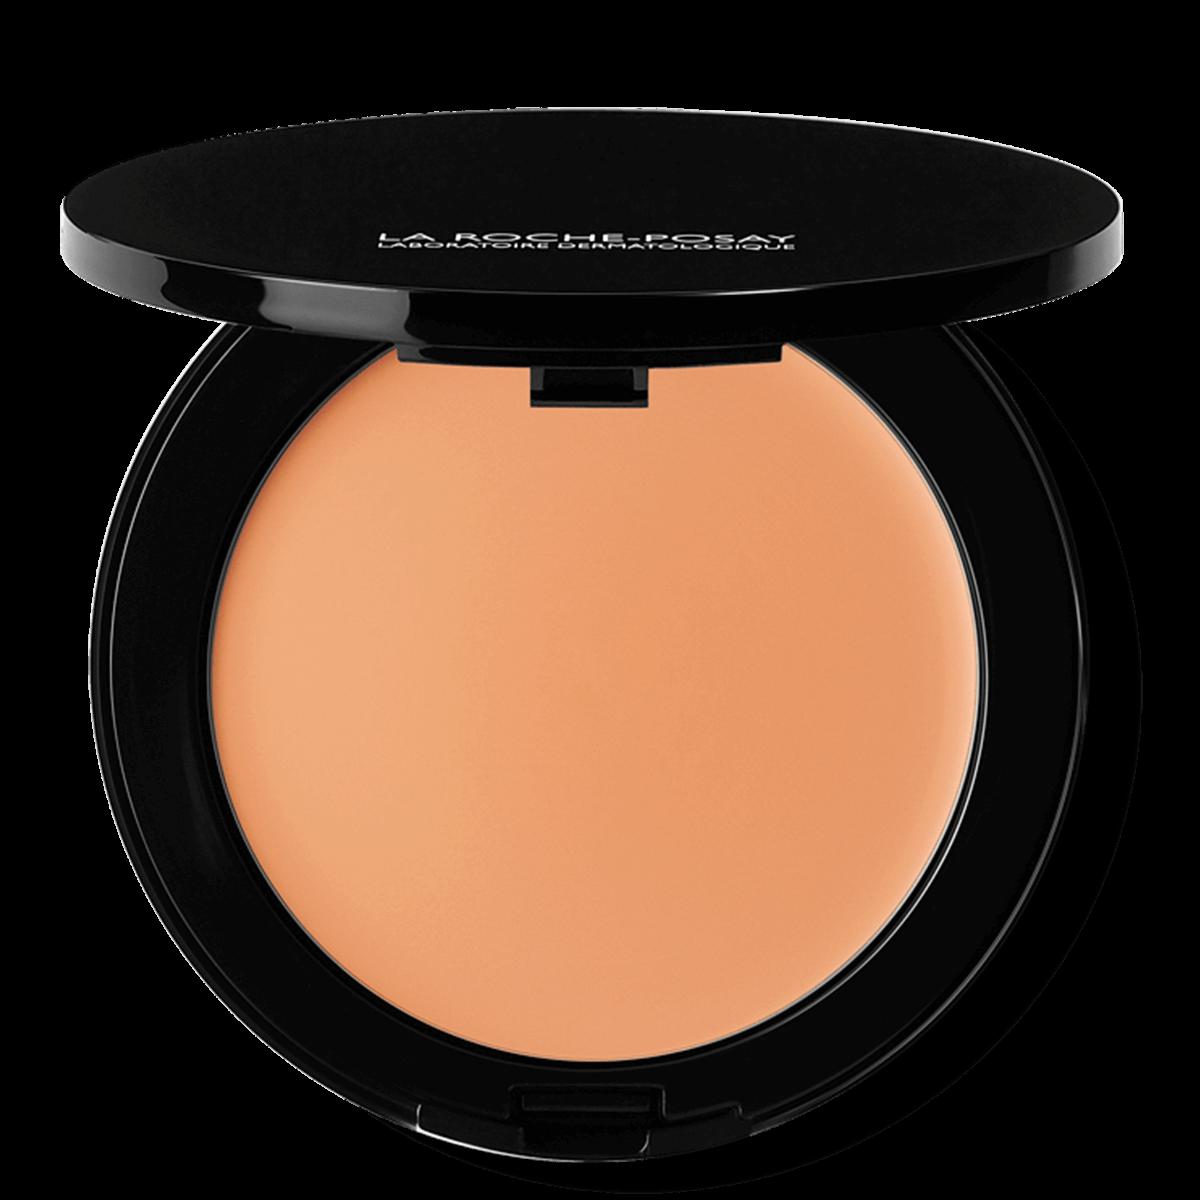 La Roche Posay Sensitiv Toleriane Makeup KOMPAKT CREME 13SandBeige 3